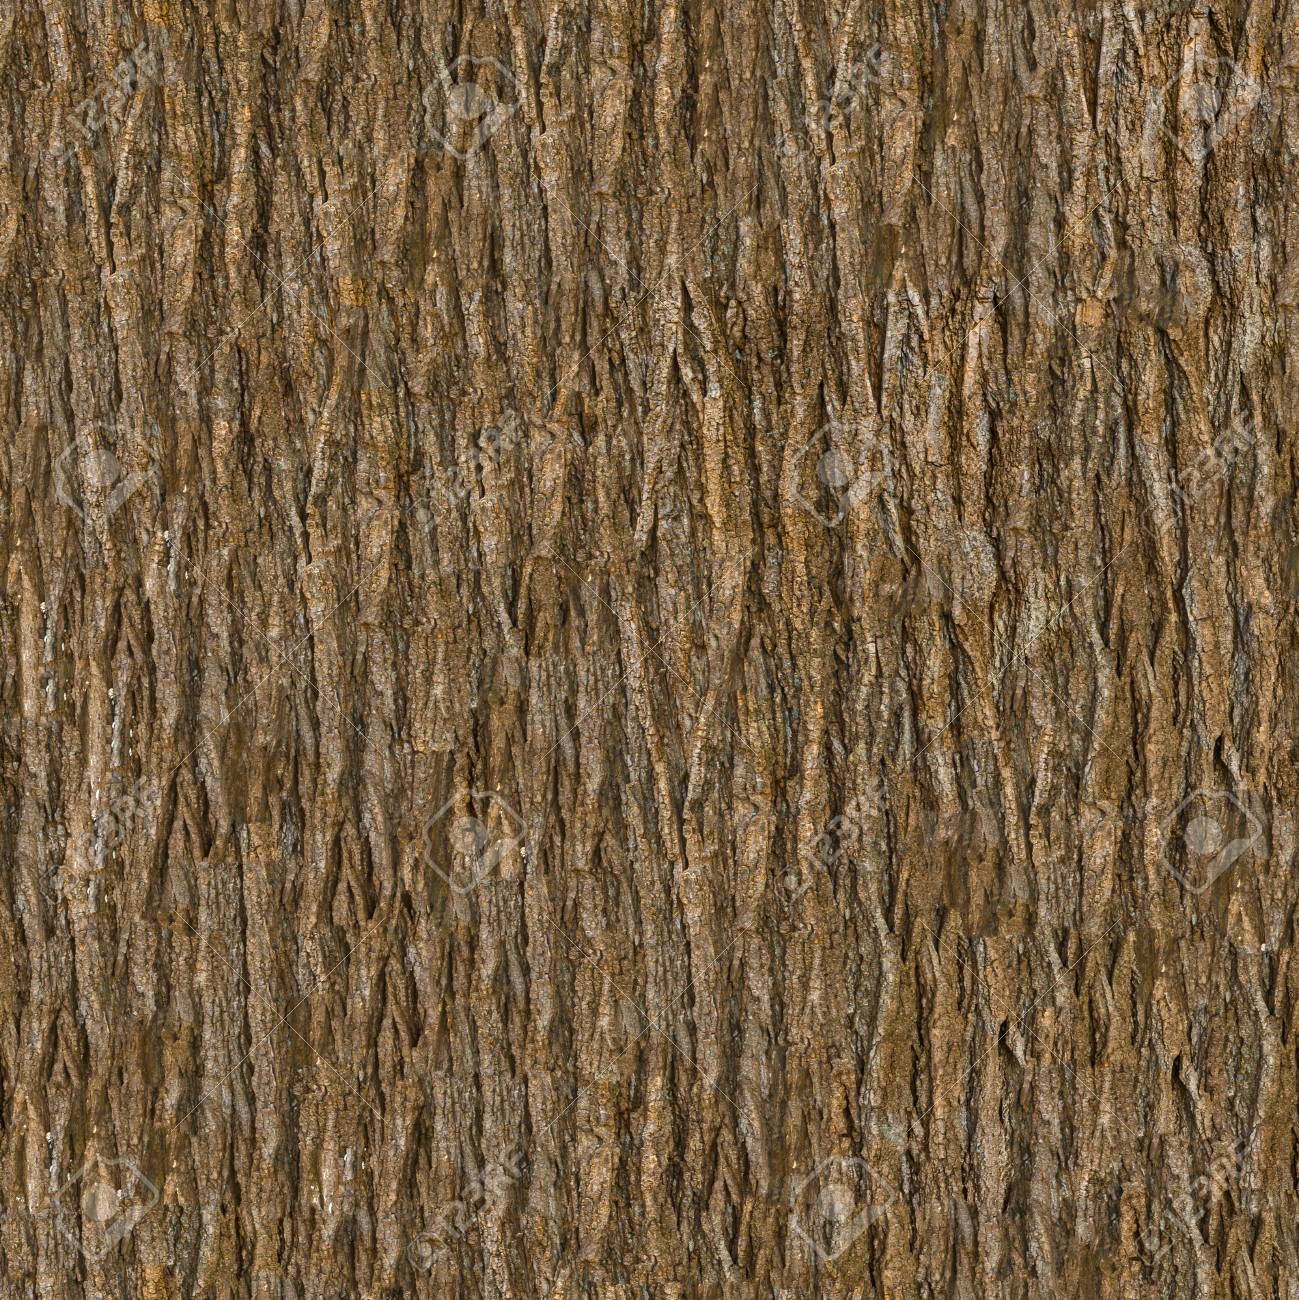 Wooden Bark. Seamless Tileable Texture. - 101490642